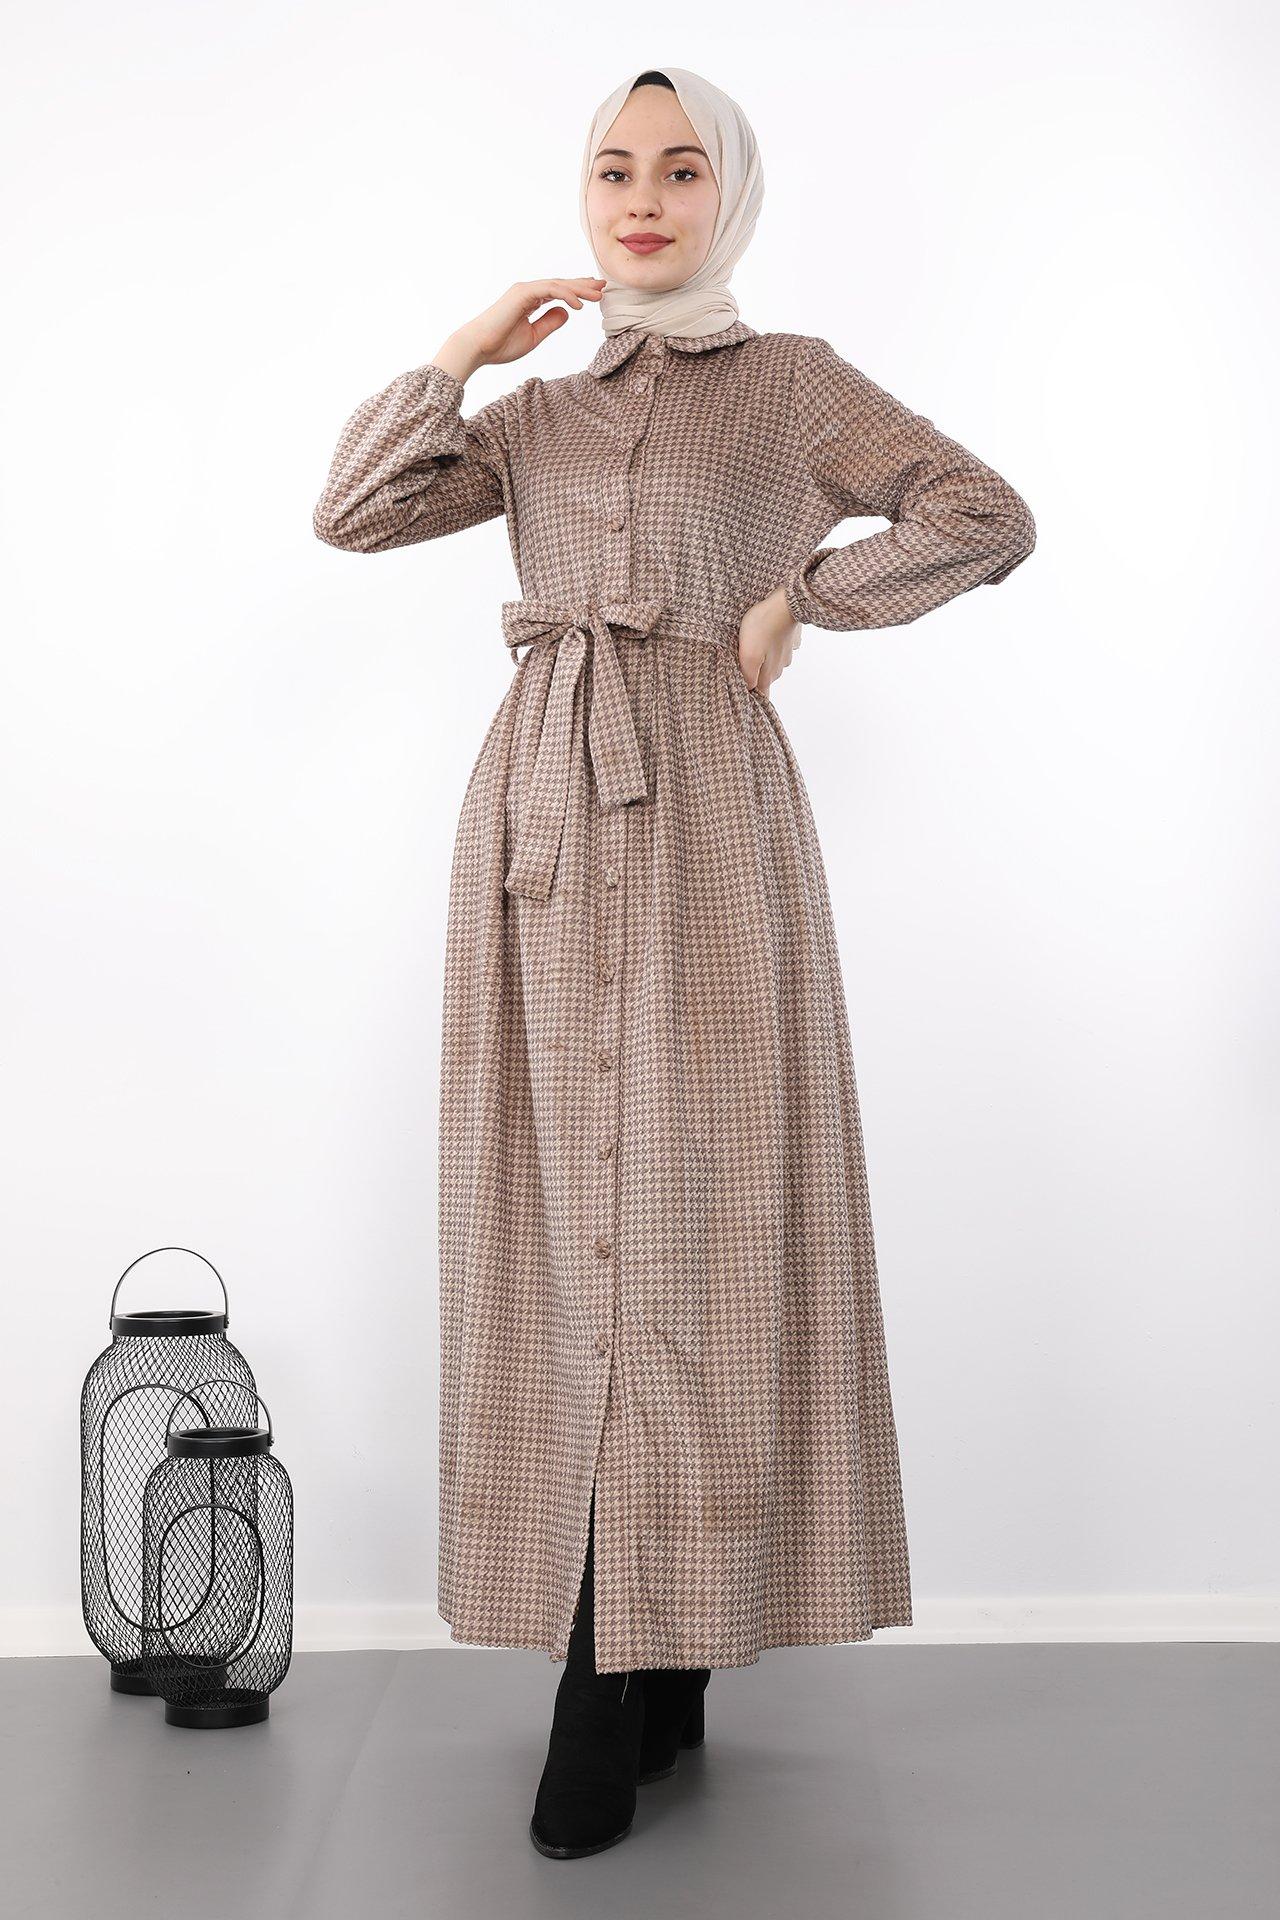 GİZAGİYİM - Tam Boy Düğmeli Elbise Vizon